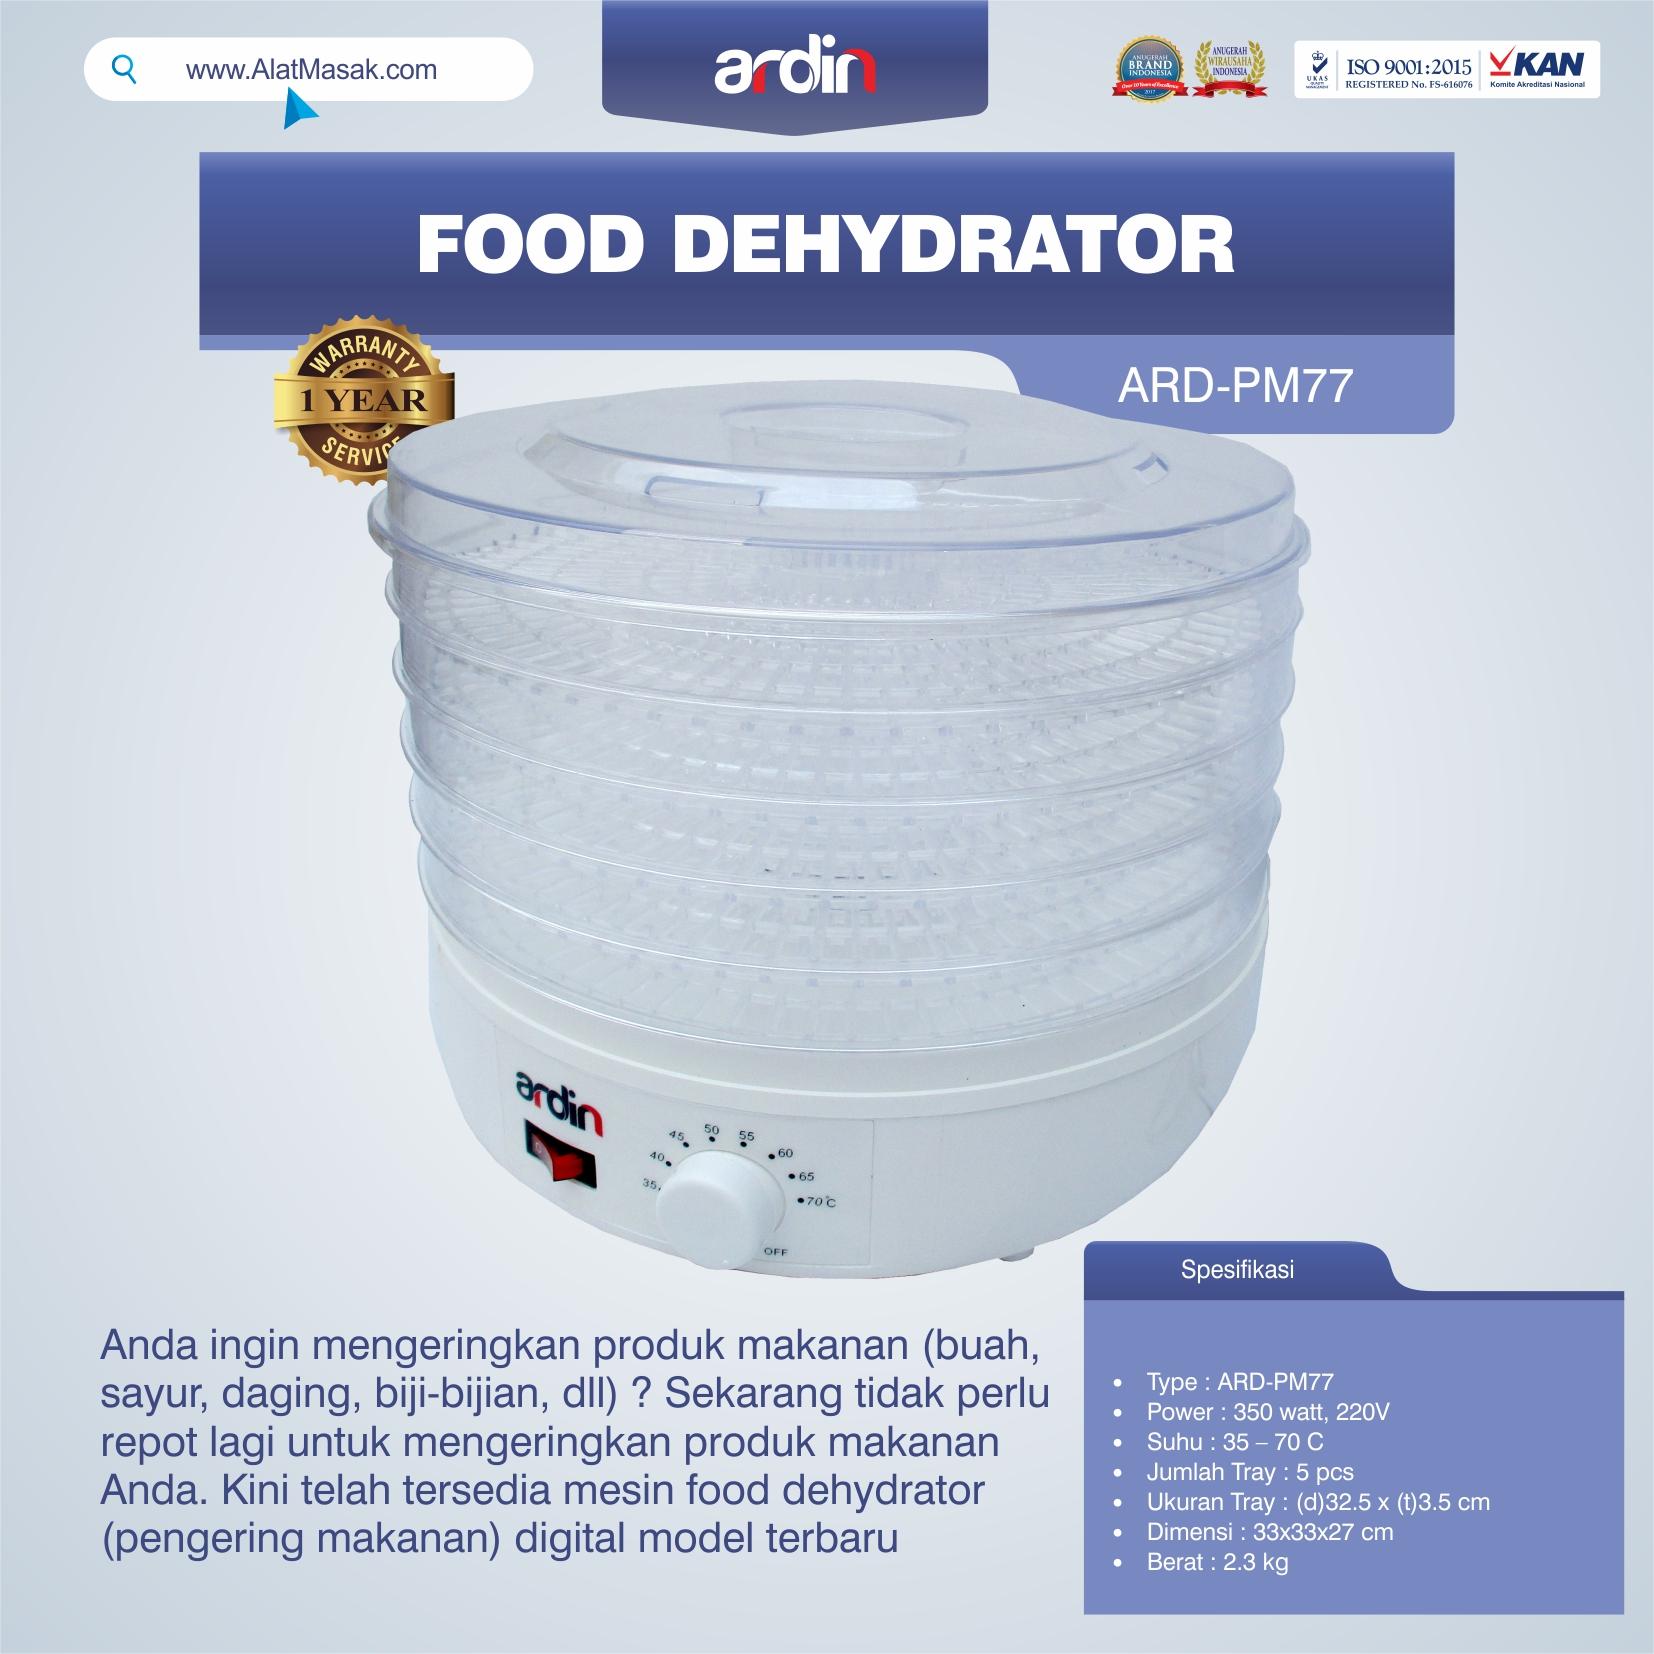 Jual Food Dehydrator ARD-PM77 di Pekanbaru